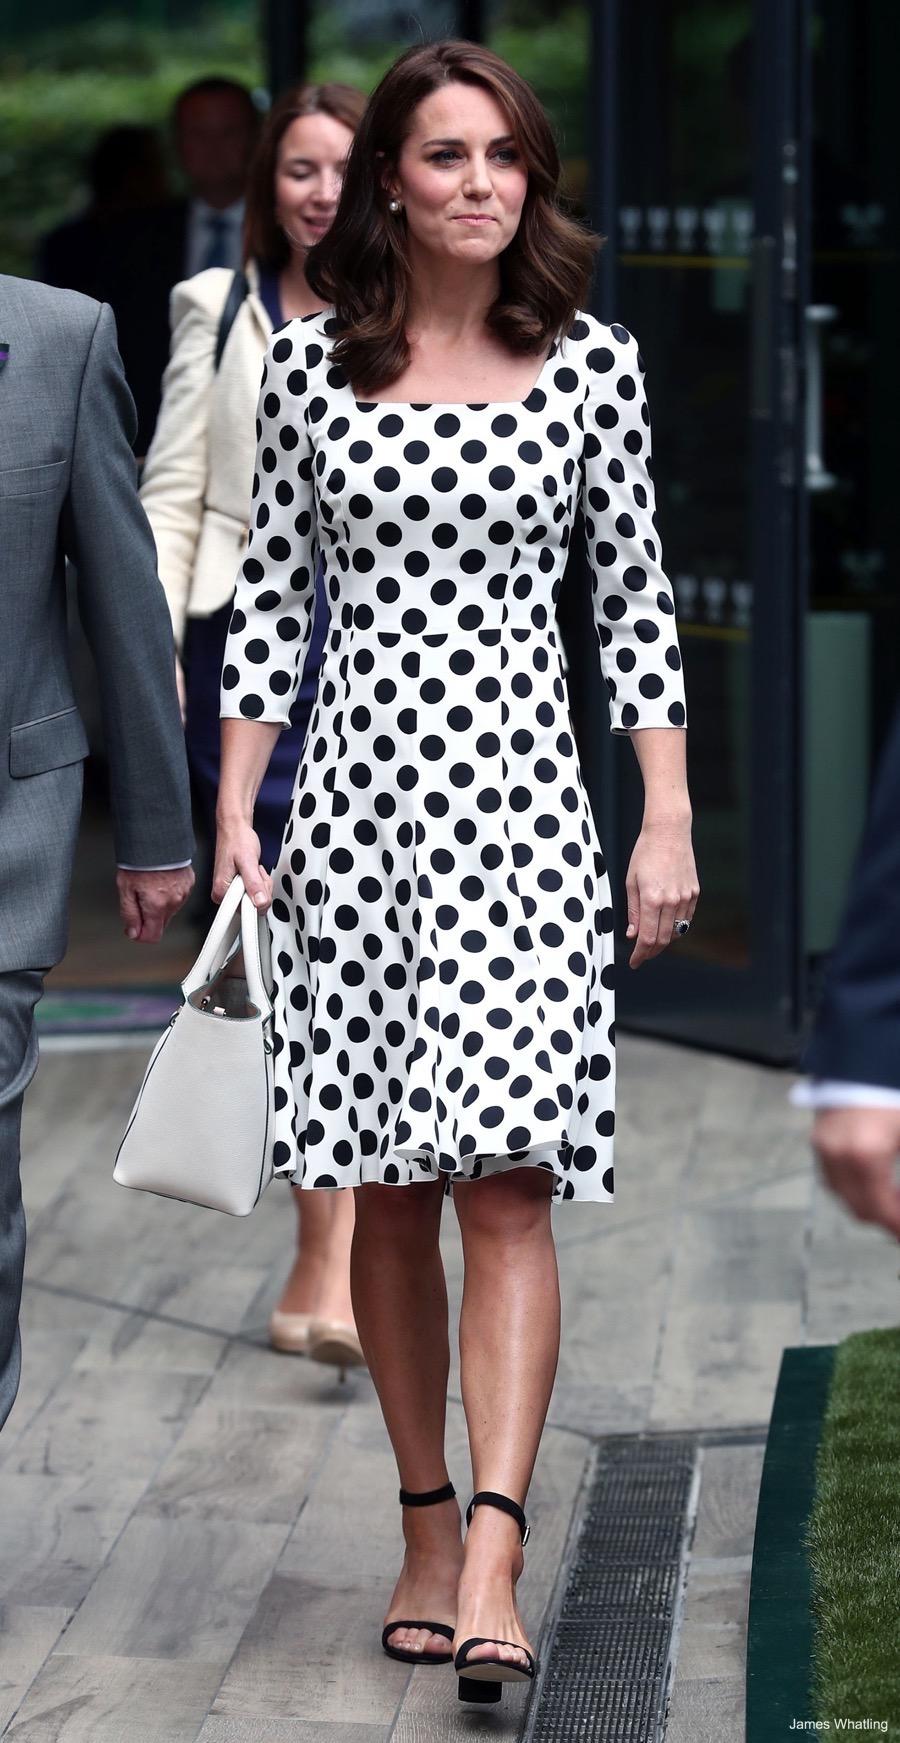 Kate Middleton wears black & white polka dot dress to ...